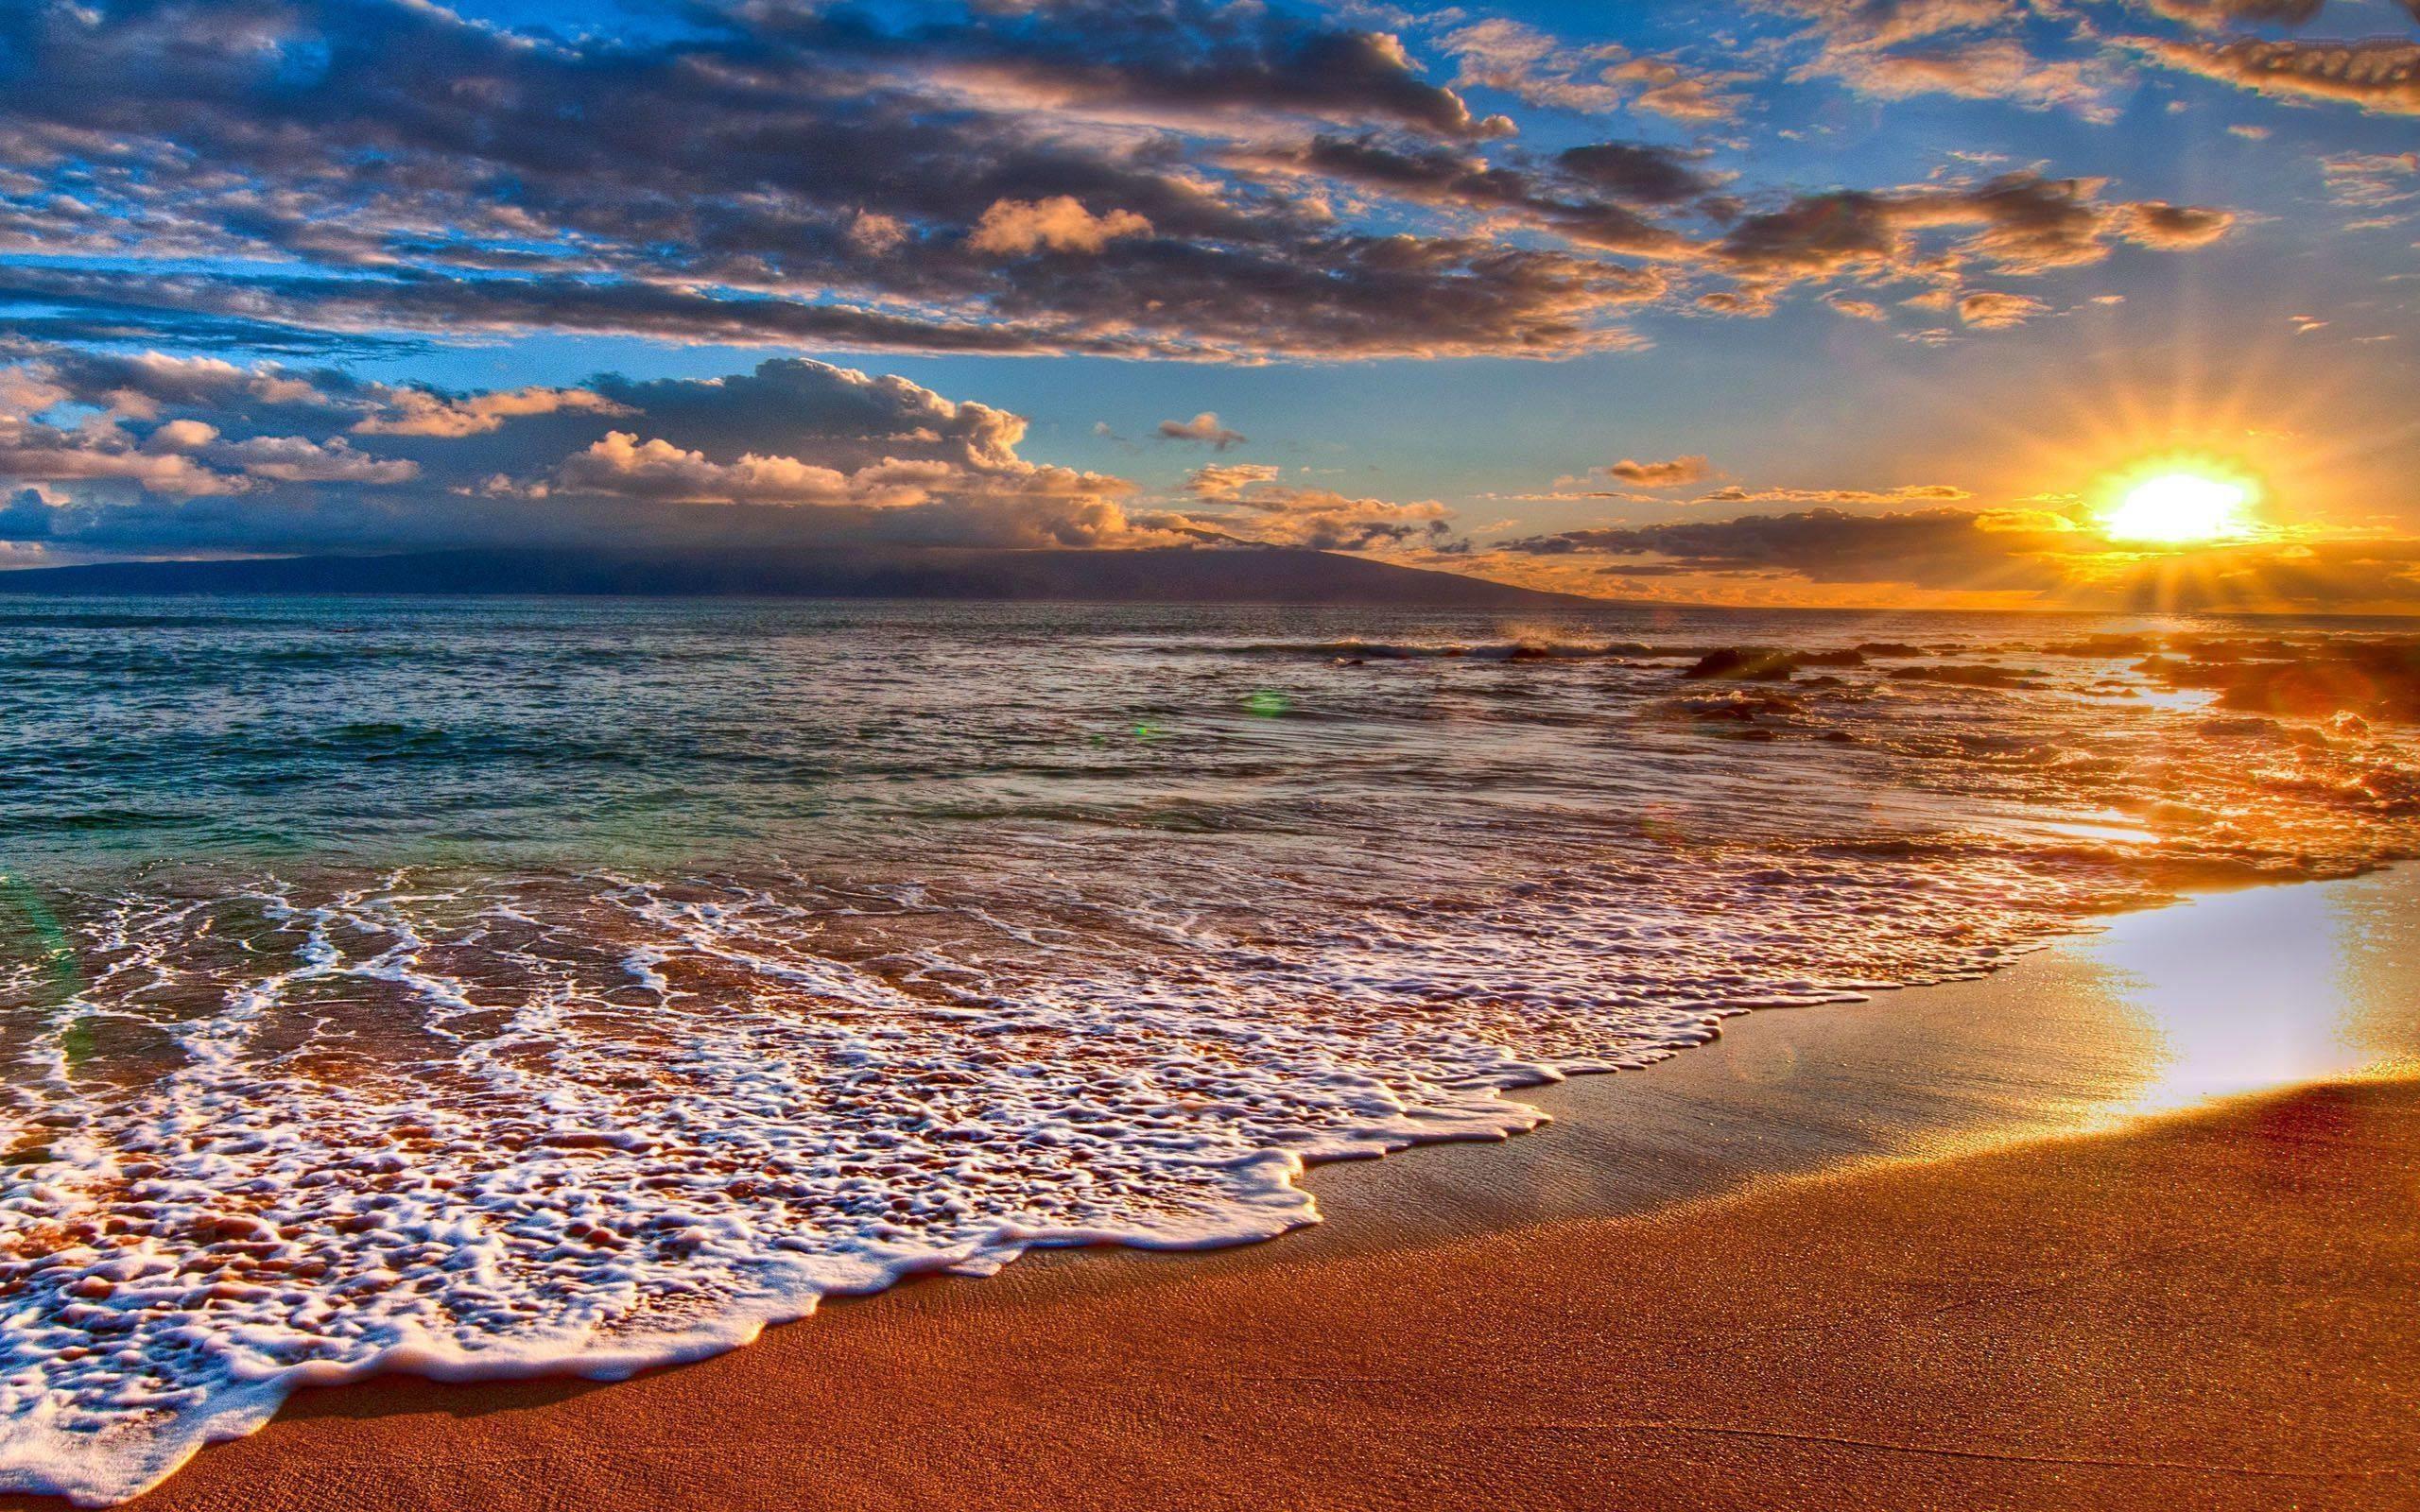 Desktop Backgrounds Beach (61+ images)